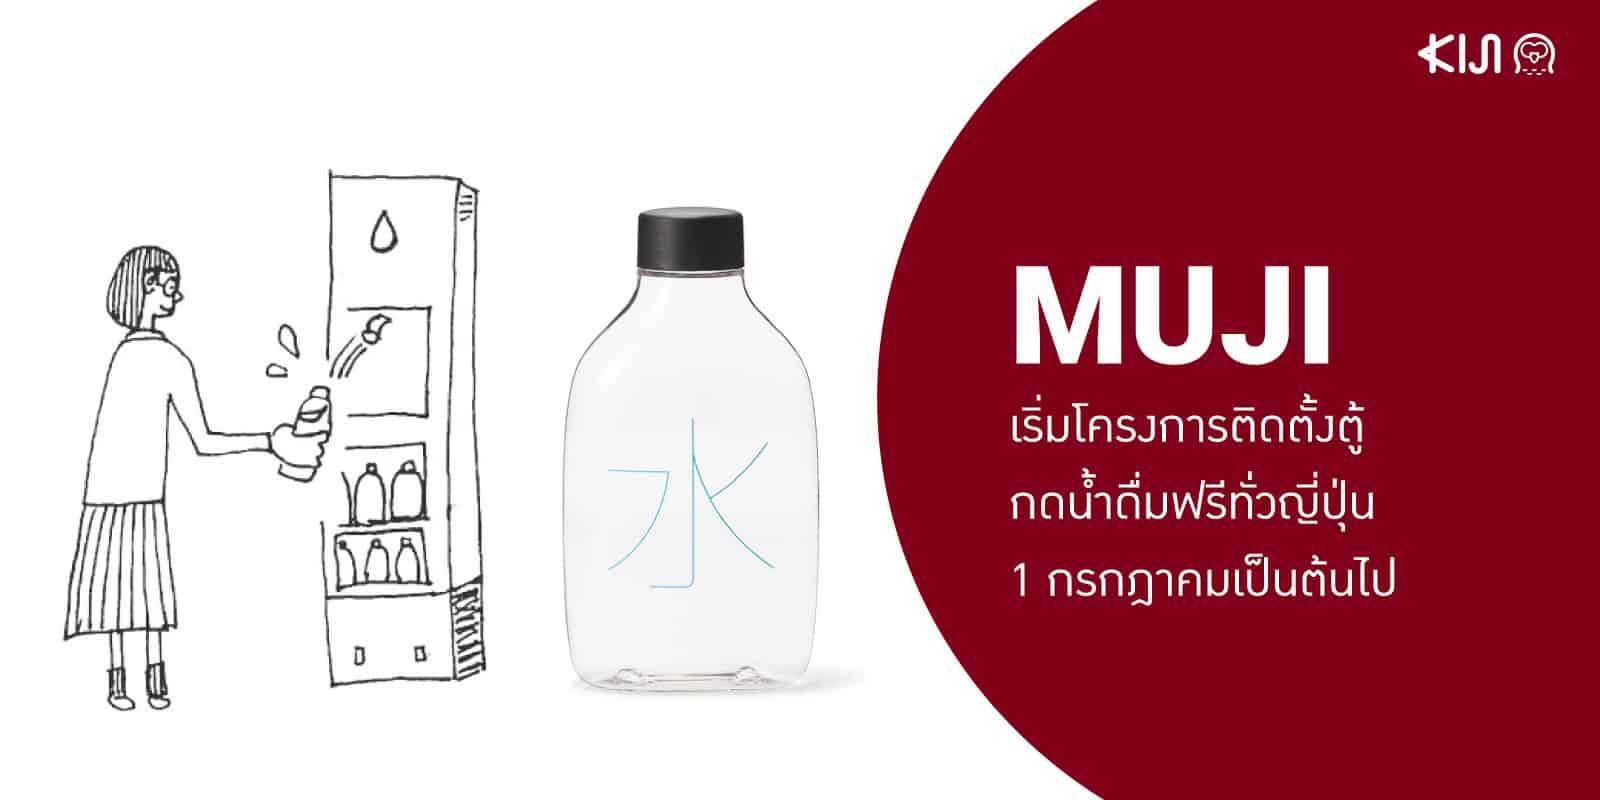 muji ตู้กดน้ำดื่ม ฟรีในญี่ปุ่น